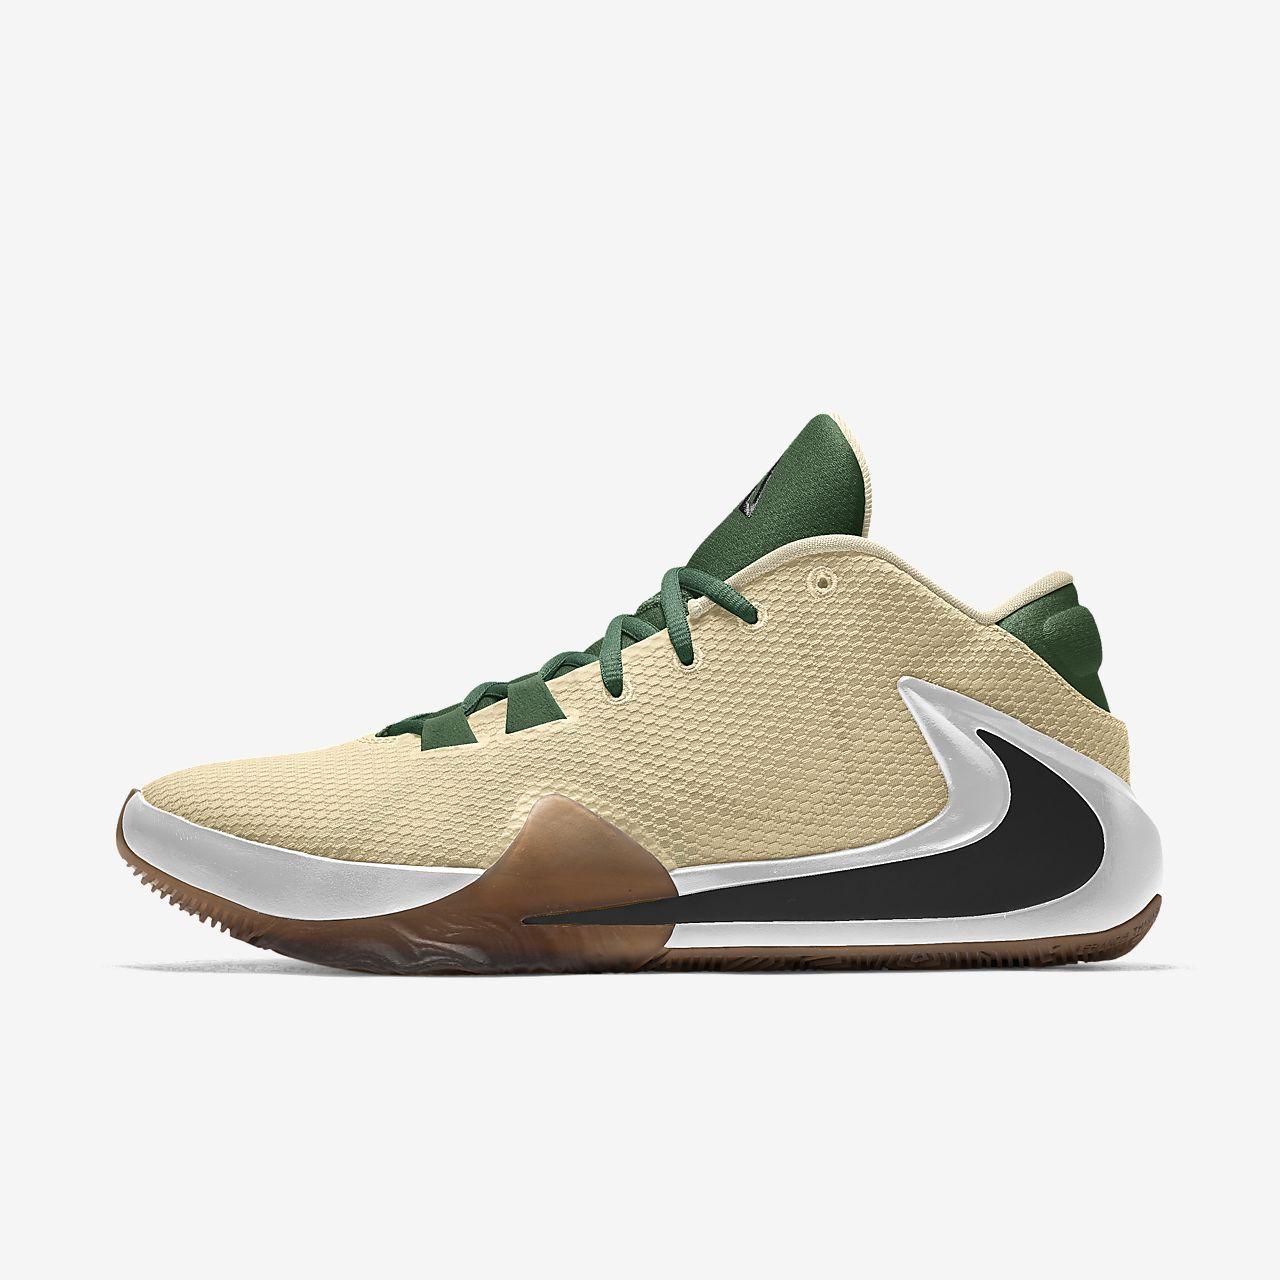 Nike Zoom Freak 1 By You tilpasset basketsko